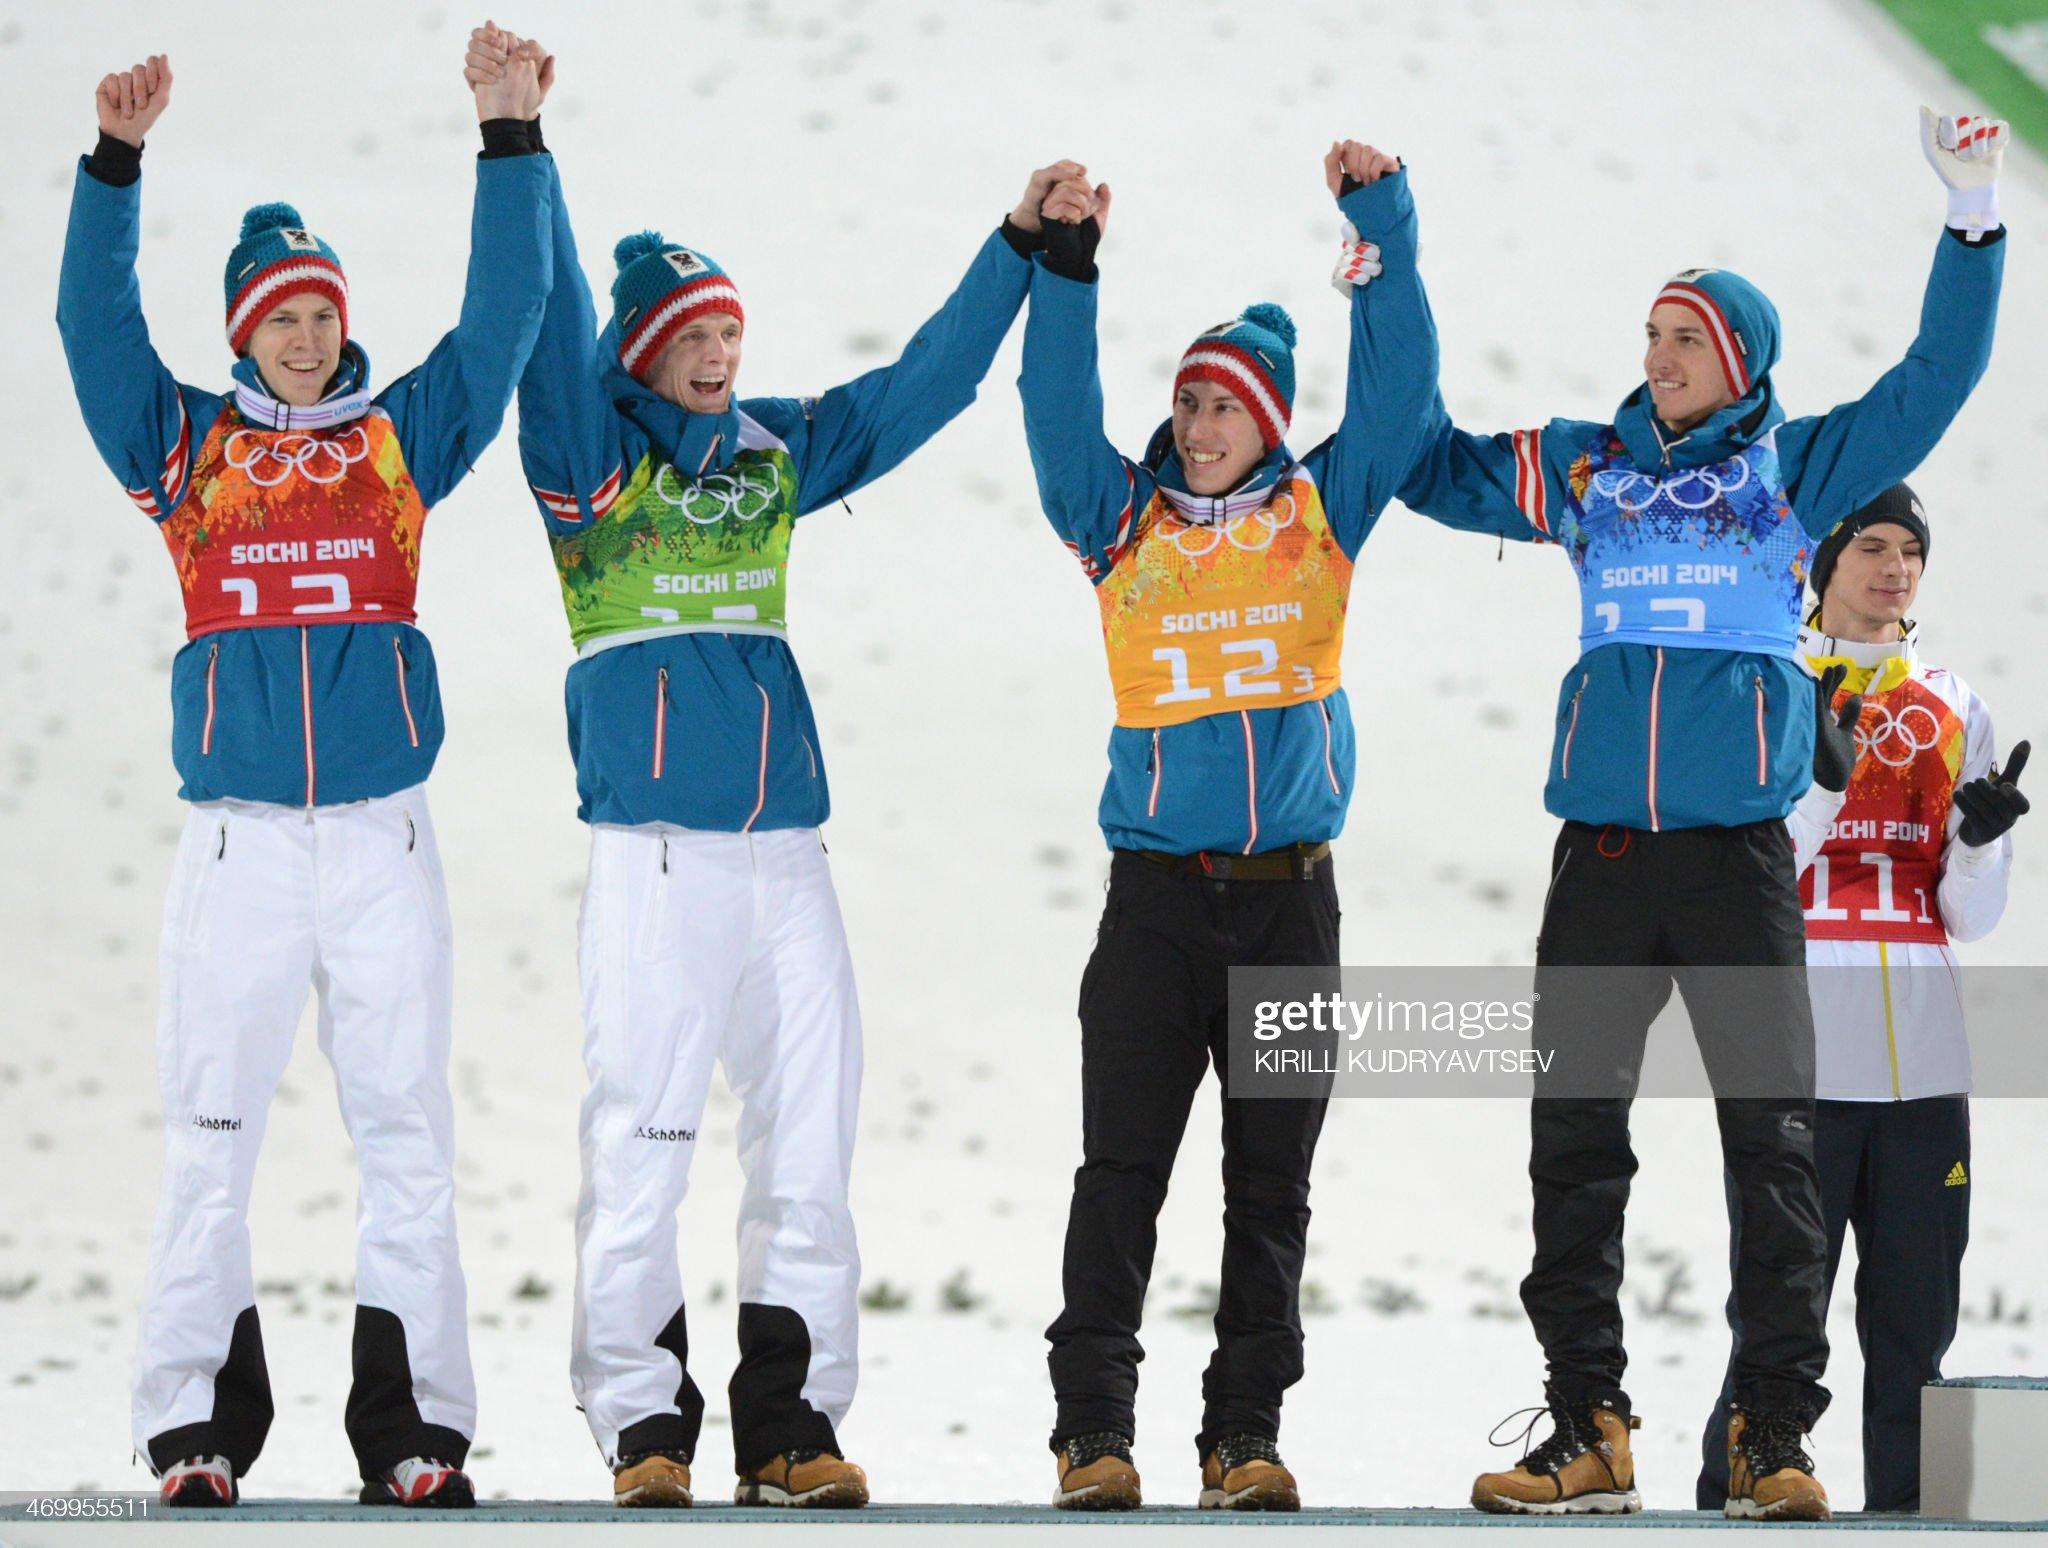 Сочи 2014: М. Хайбек, Т. Моргенштерн, Т. Дитхарт, Г. Шлиренцауэр – серебряные призеры Олимпийских игр